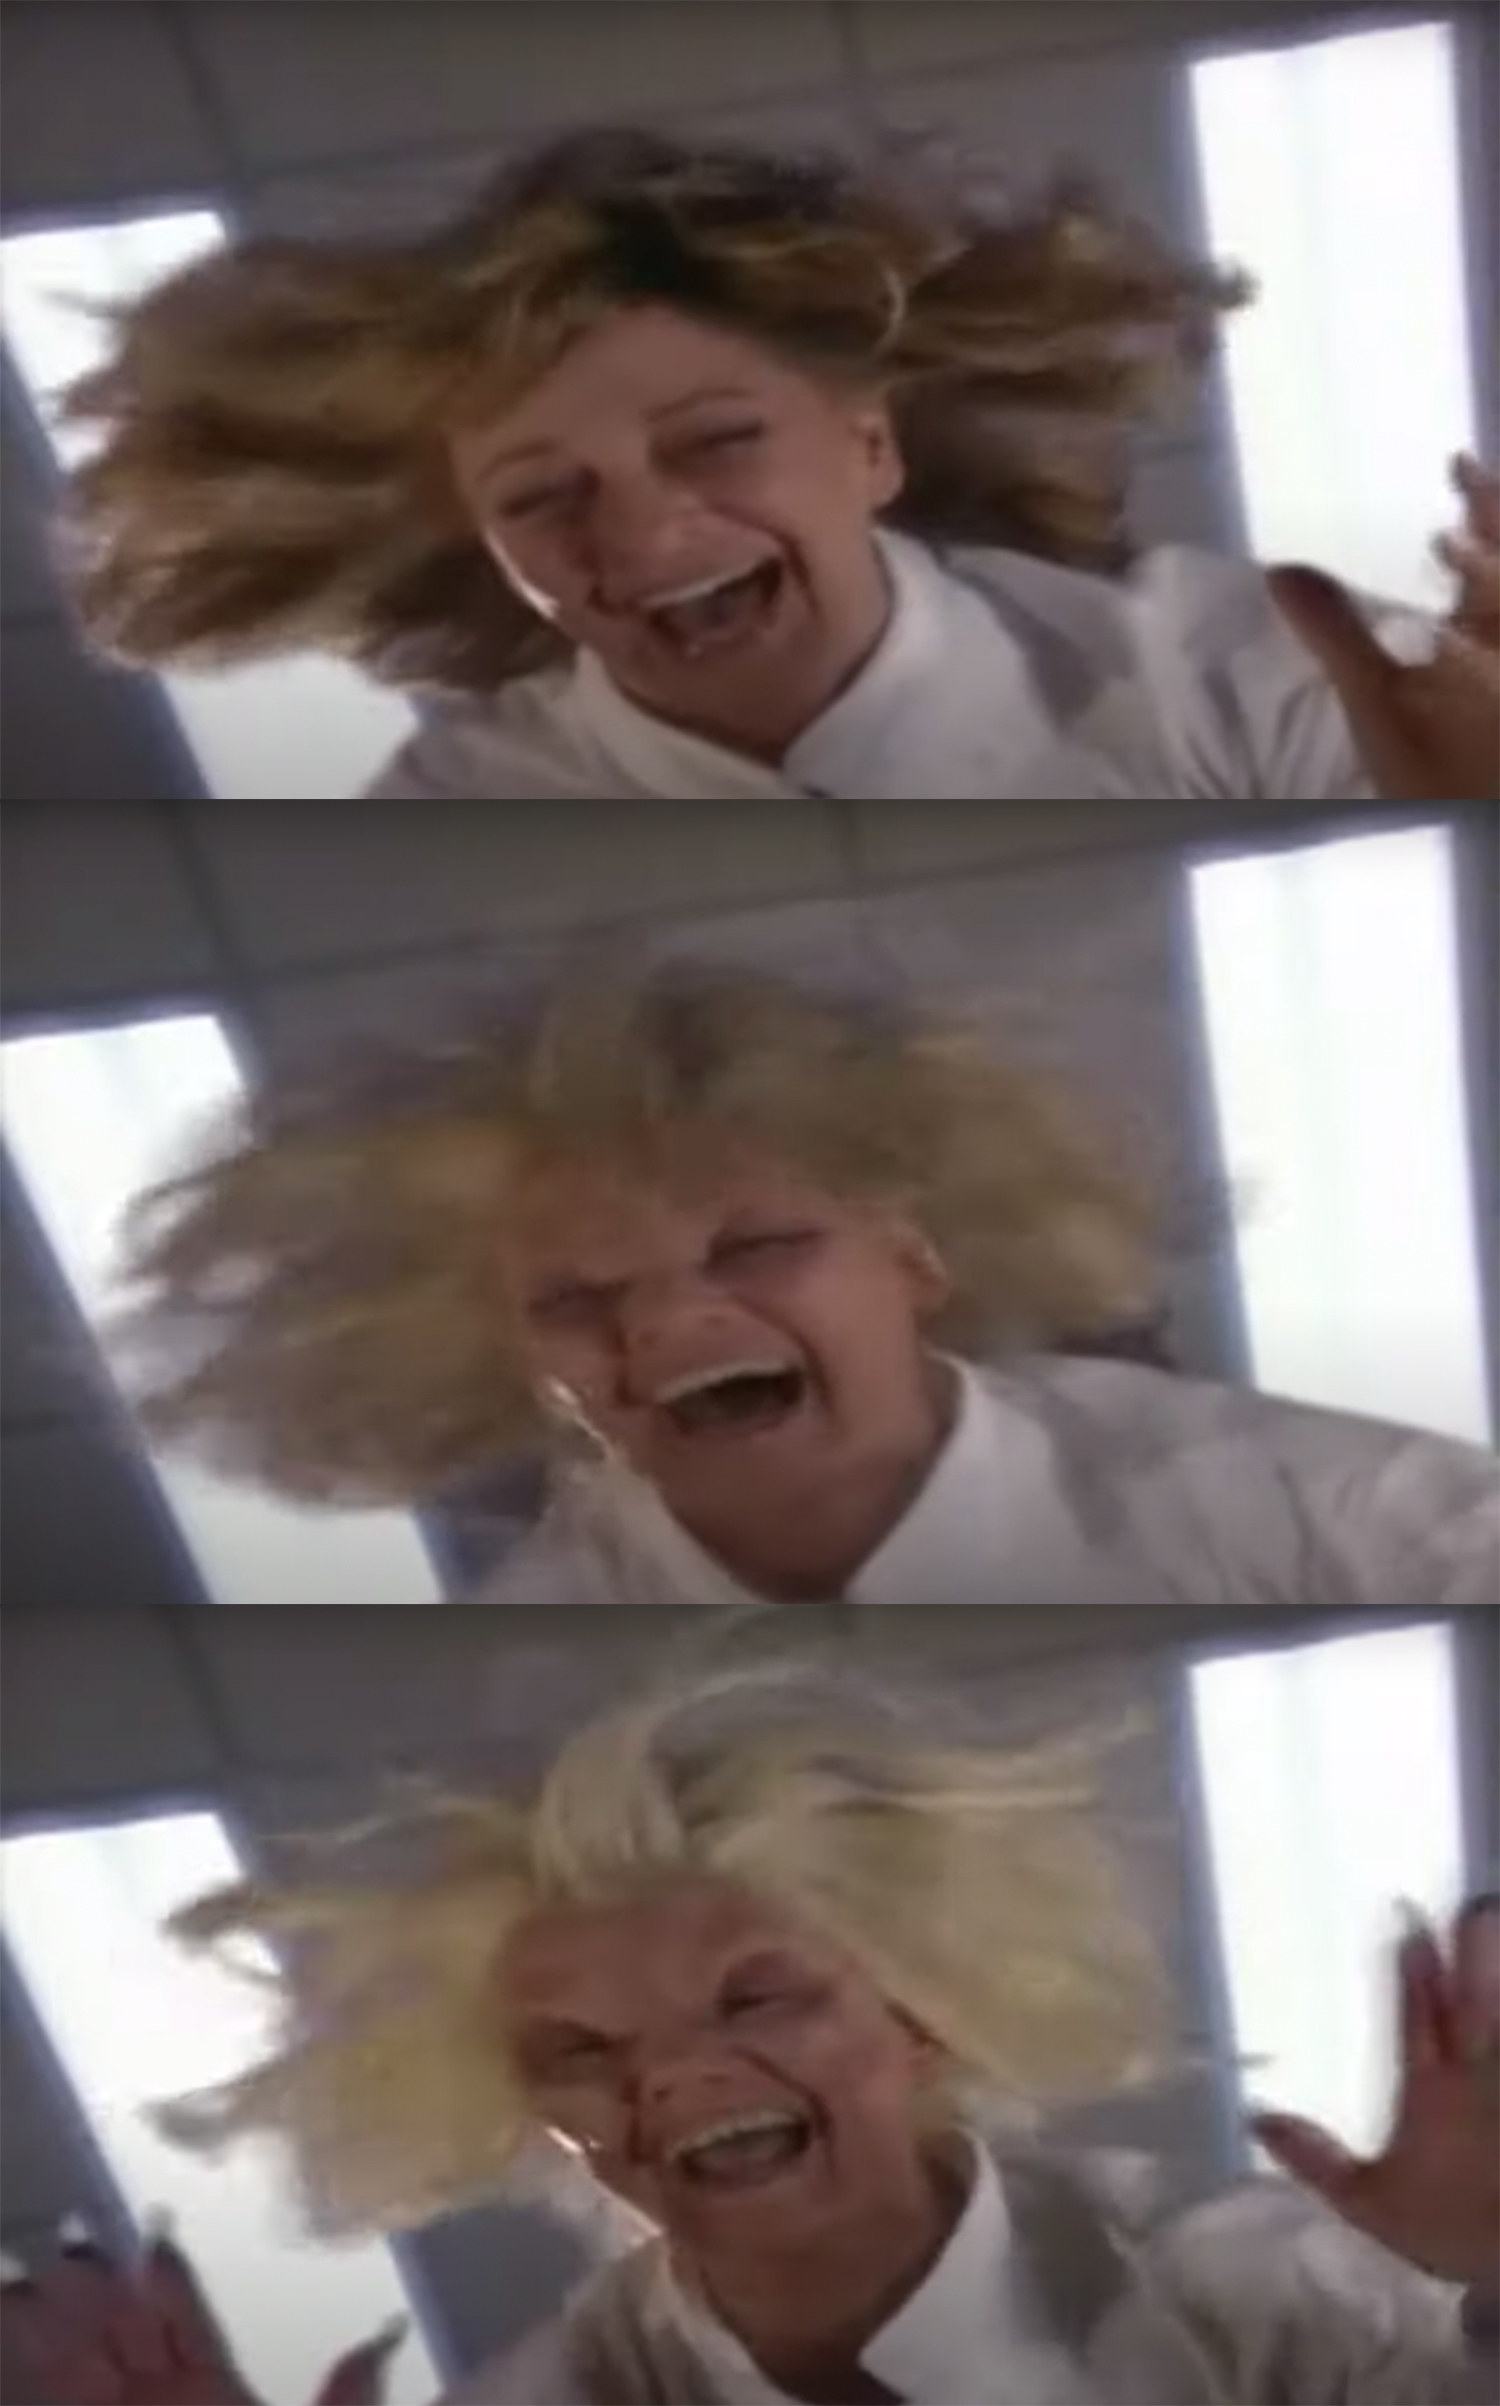 Marlena's face morphs into the devil